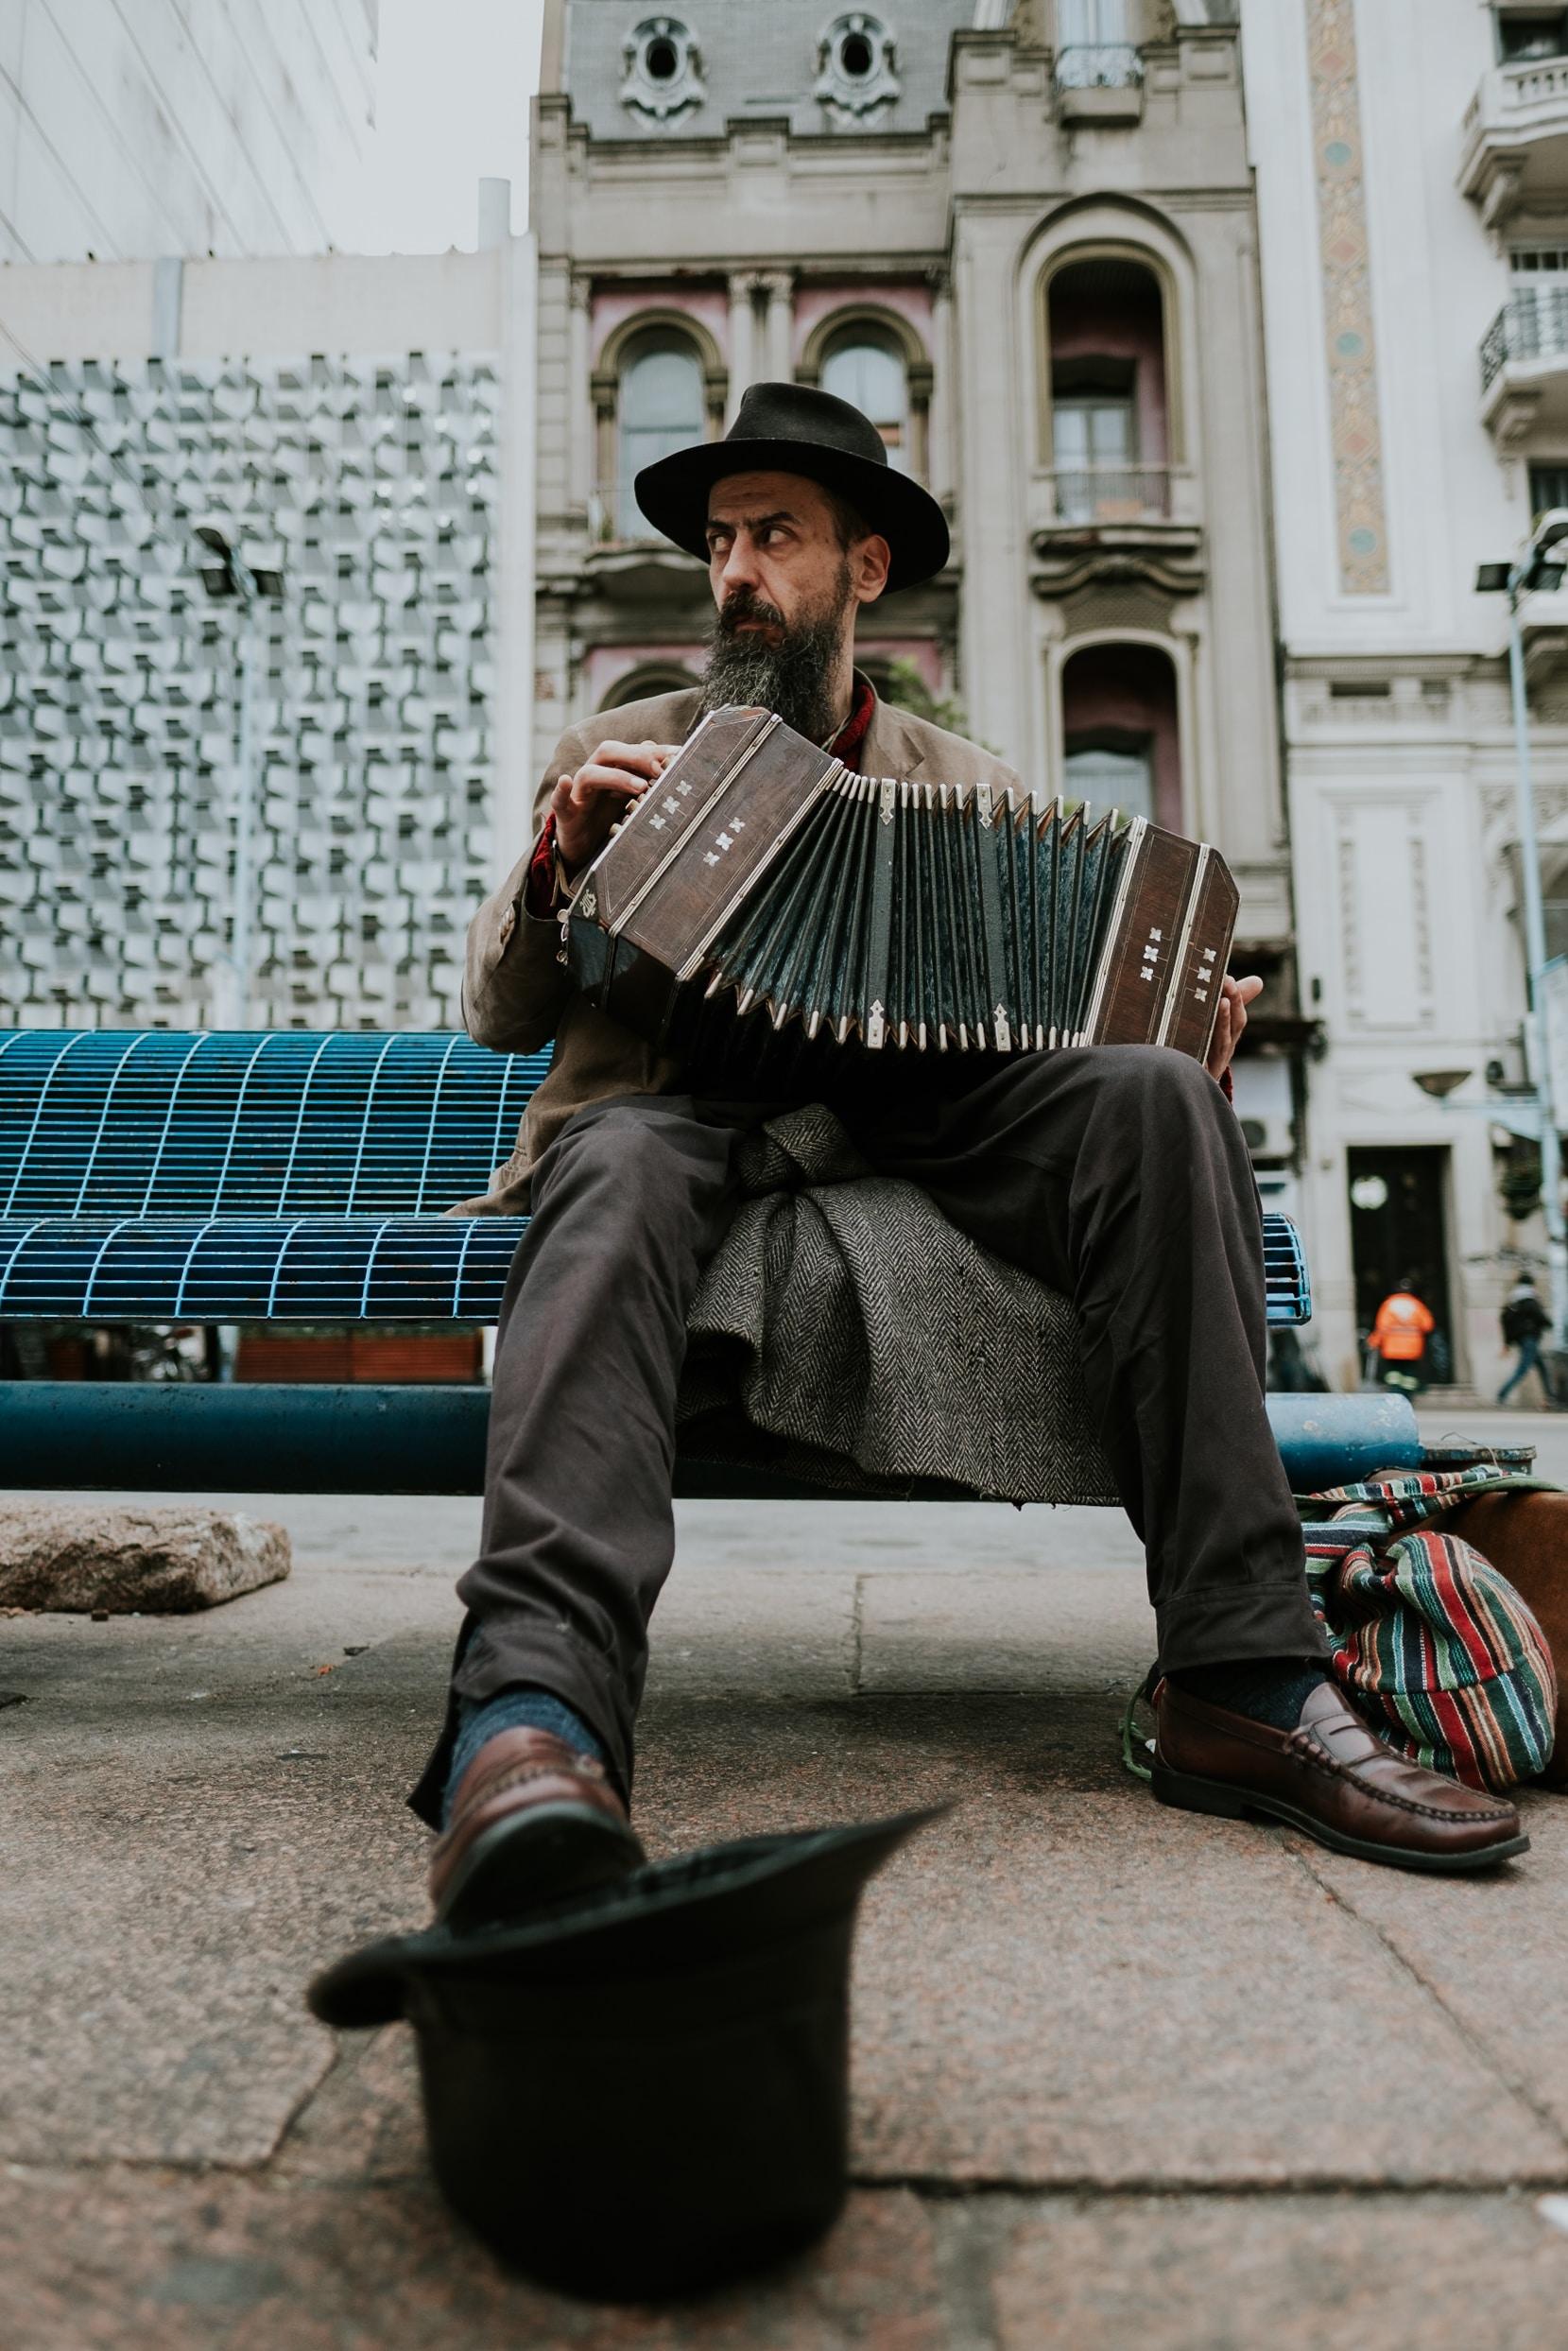 man sitting on bench playing accordion